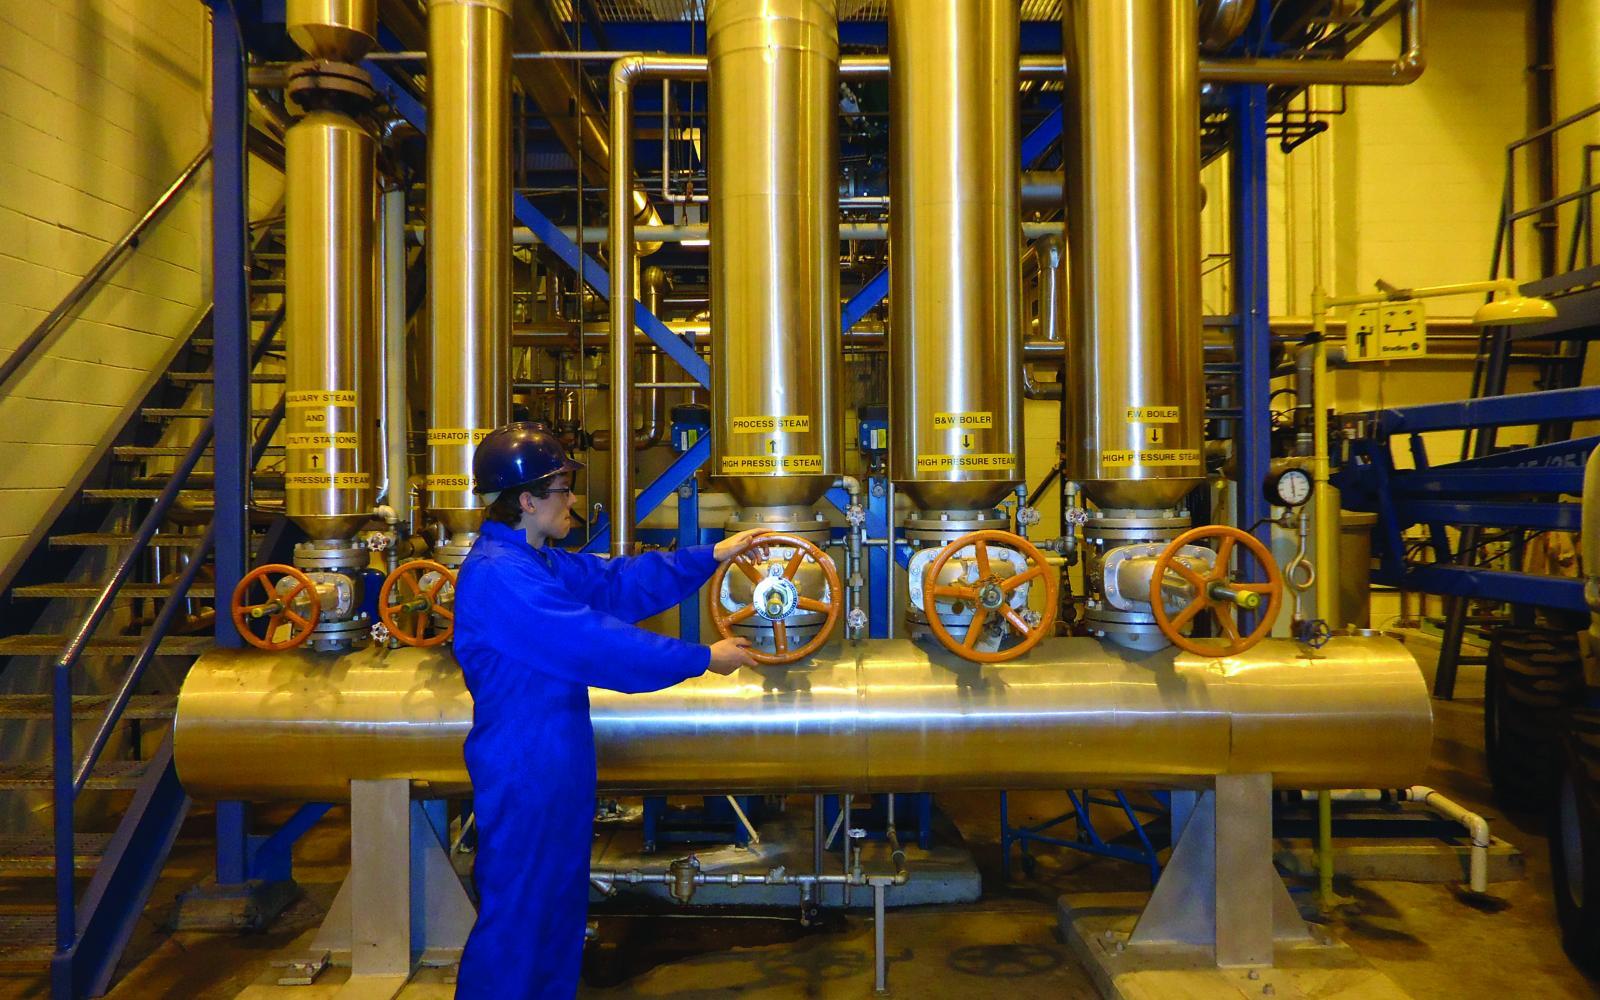 Power Engineering Process Operator - 4th Class Program